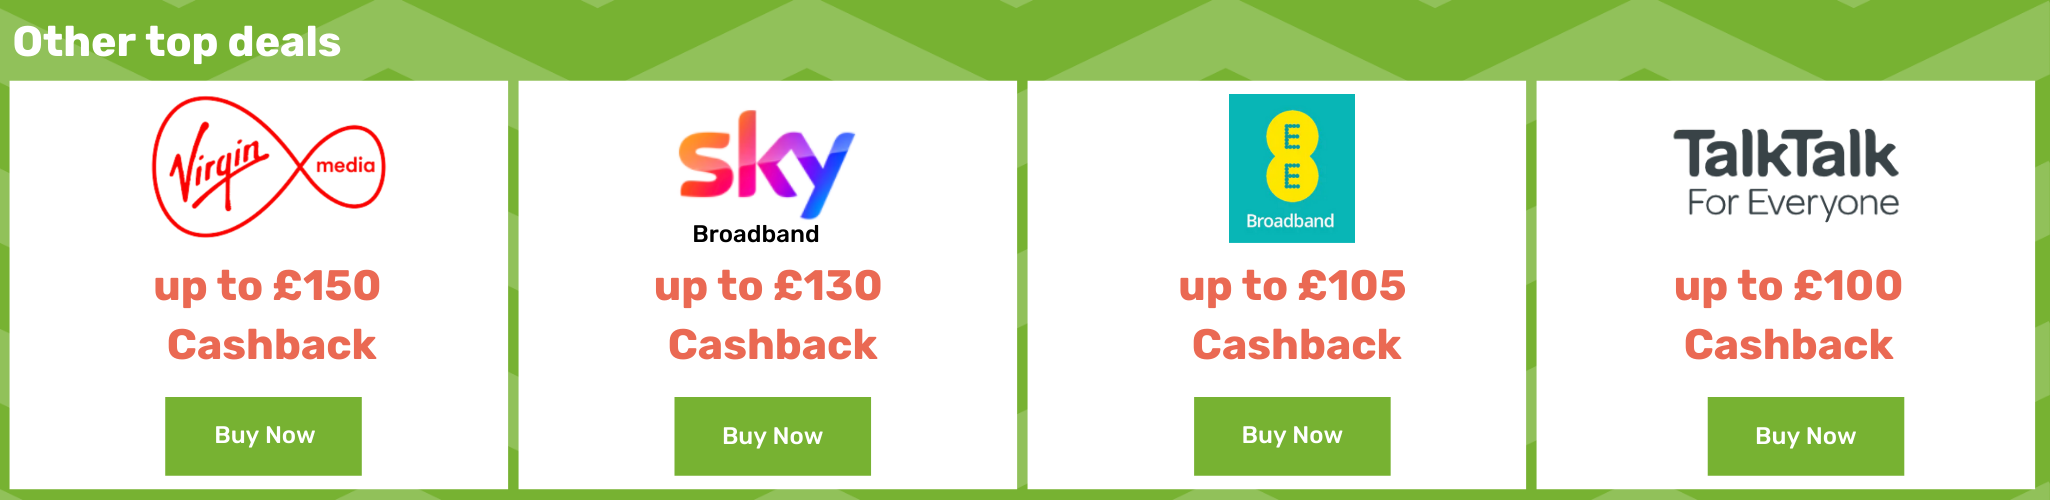 Virgin Media up to £150 cashback - SKY Broadband up to £150 cashback - EE Broadband up to £105 cashback - TalkTalk up to £100 cashback